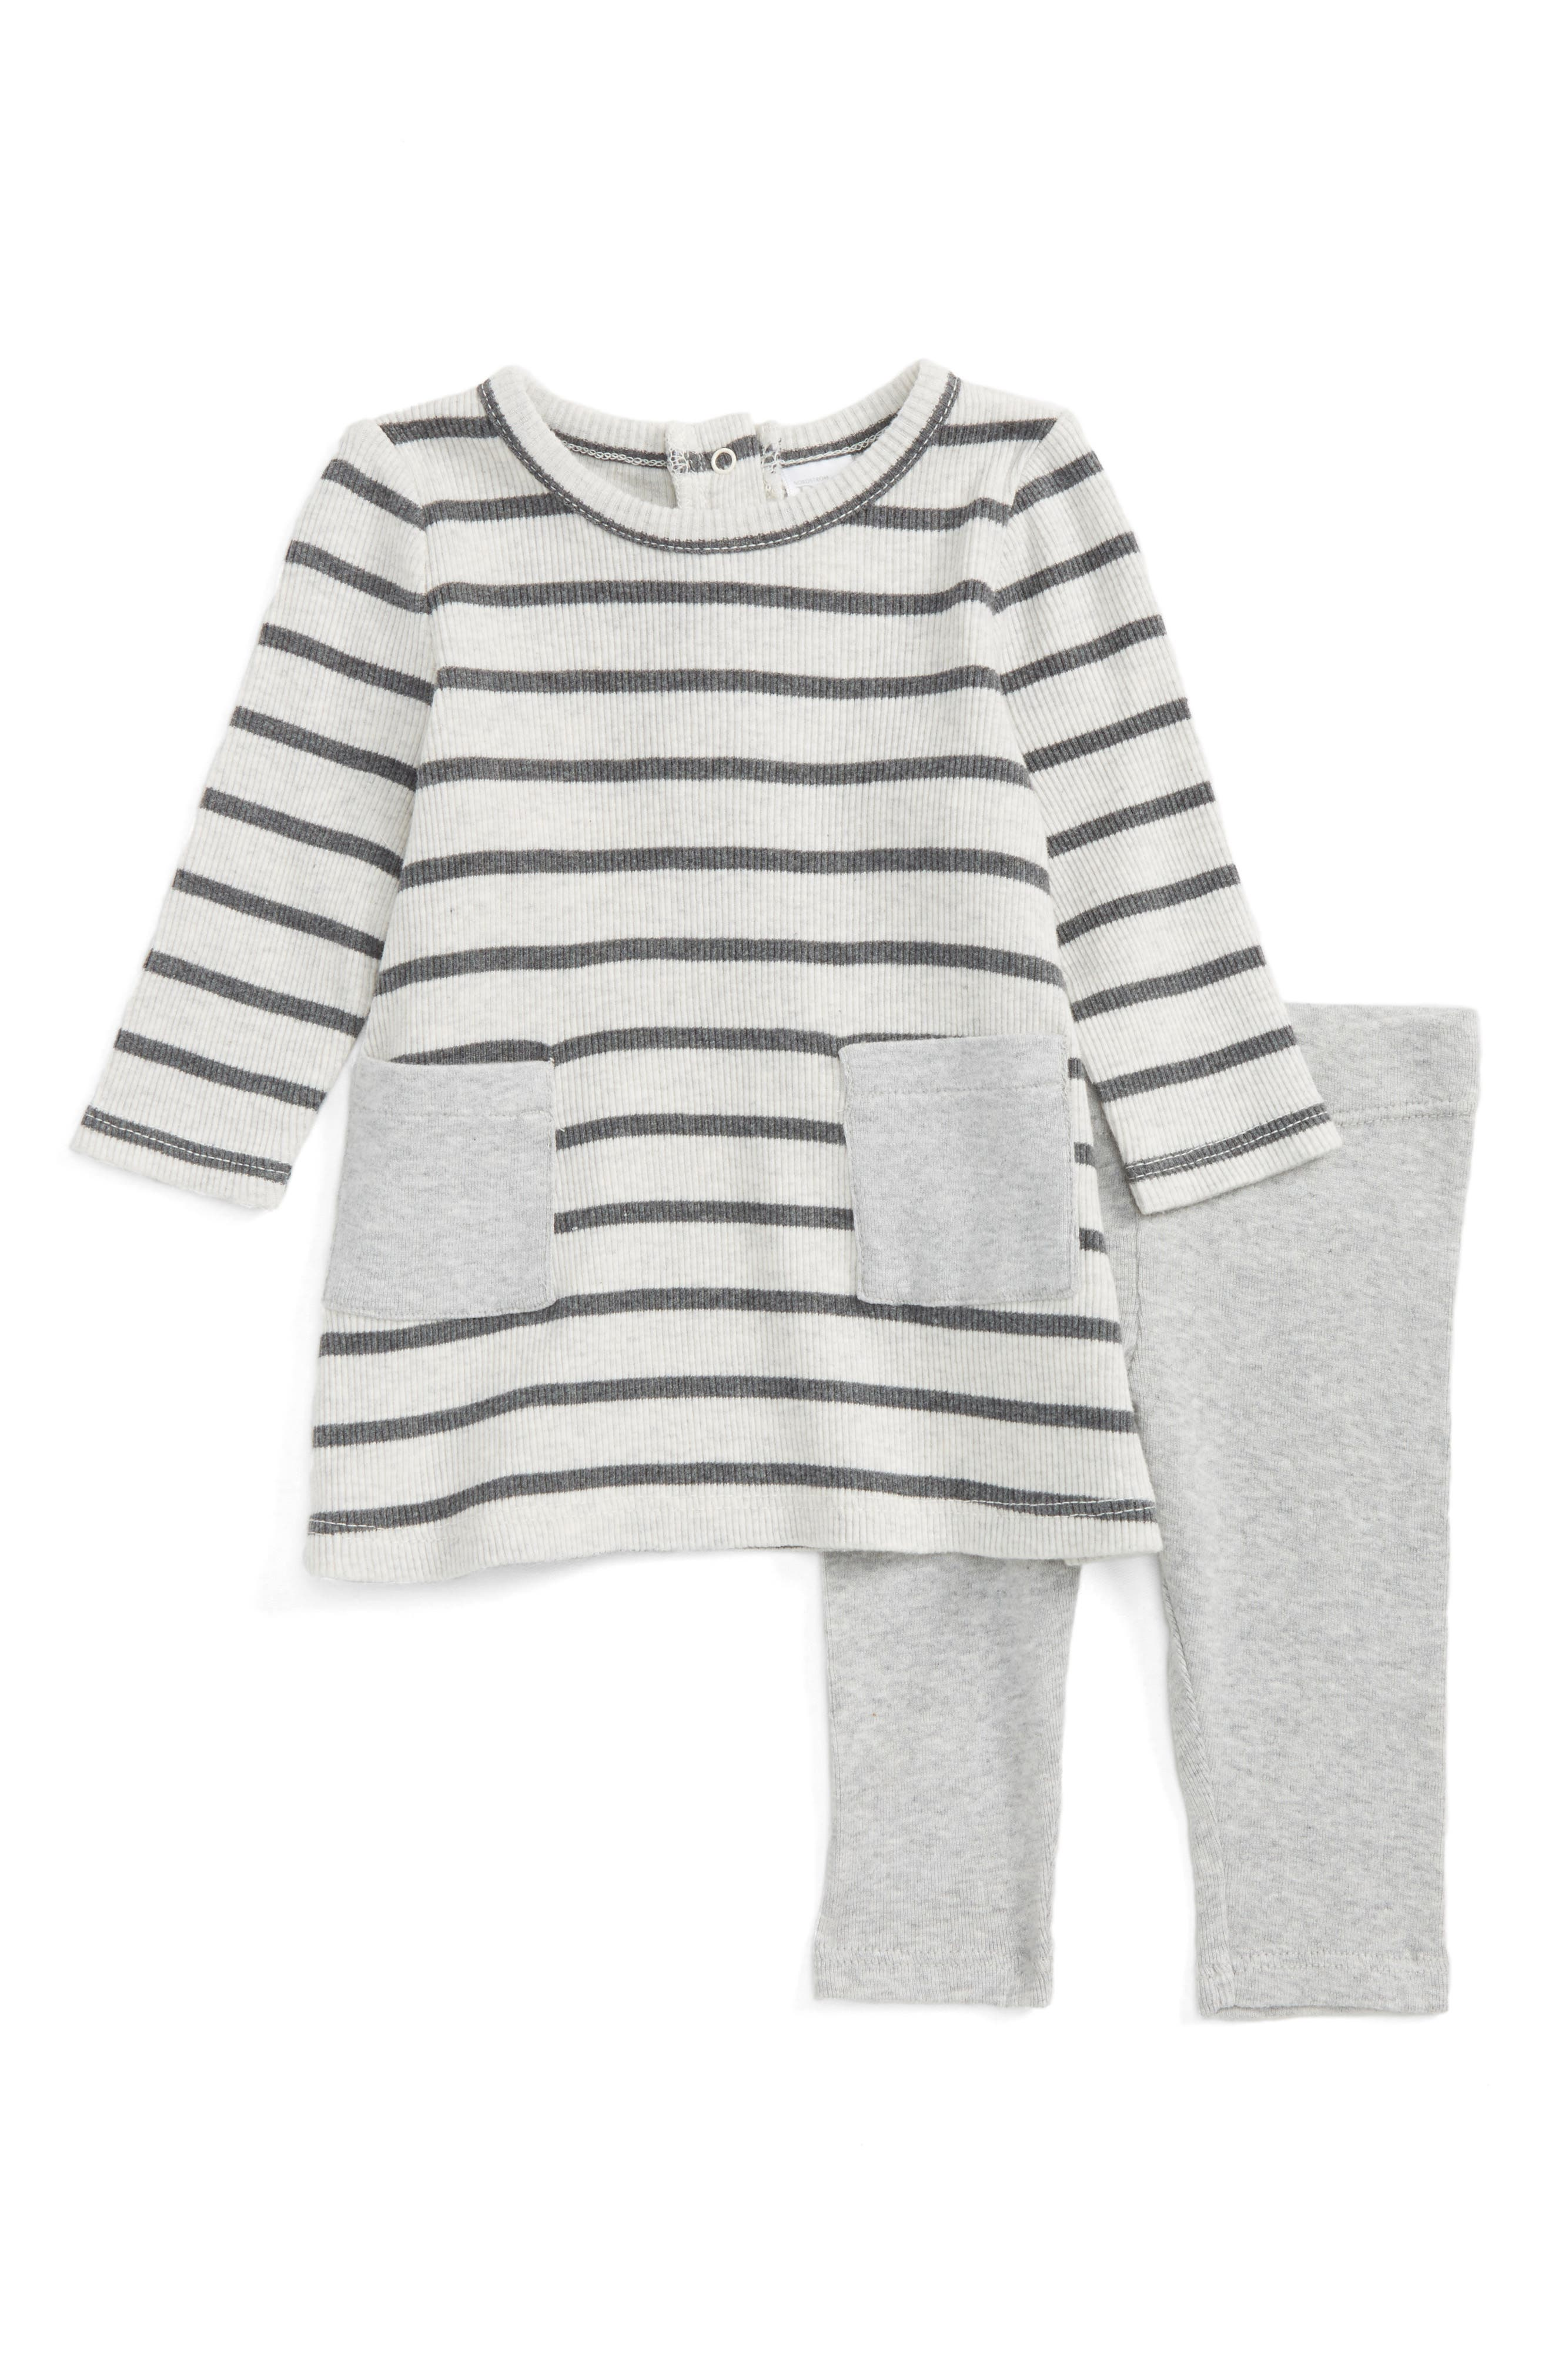 Main Image - Nordstrom Baby Stripe Dress & Leggings Set (Baby Girls)